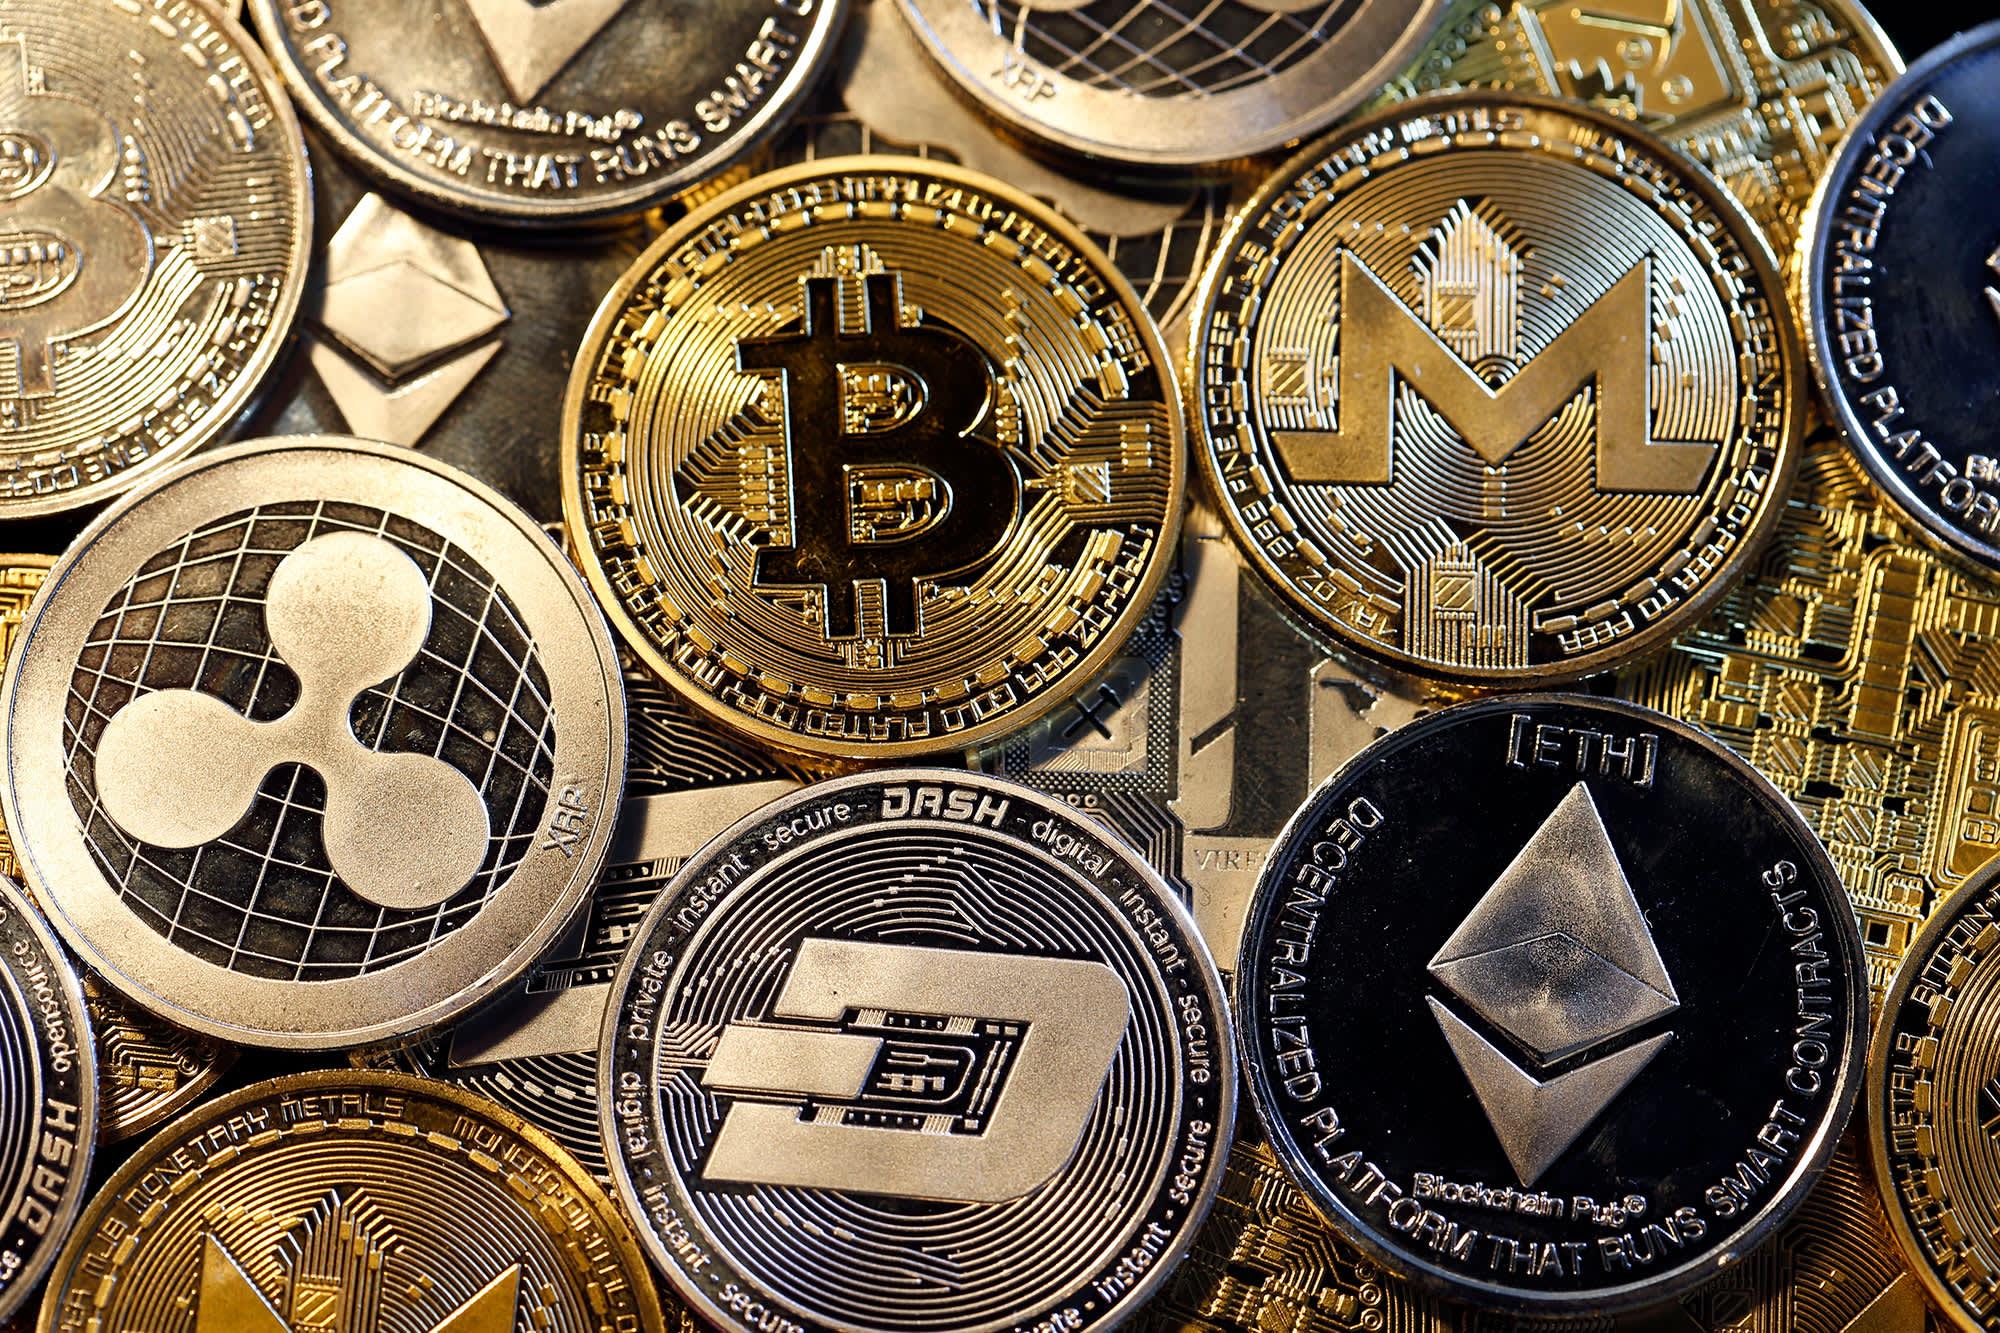 Digital cryptocurrencies, Bitcoin, Ripple, Ethernum, Dash, Monero and Litecoin.